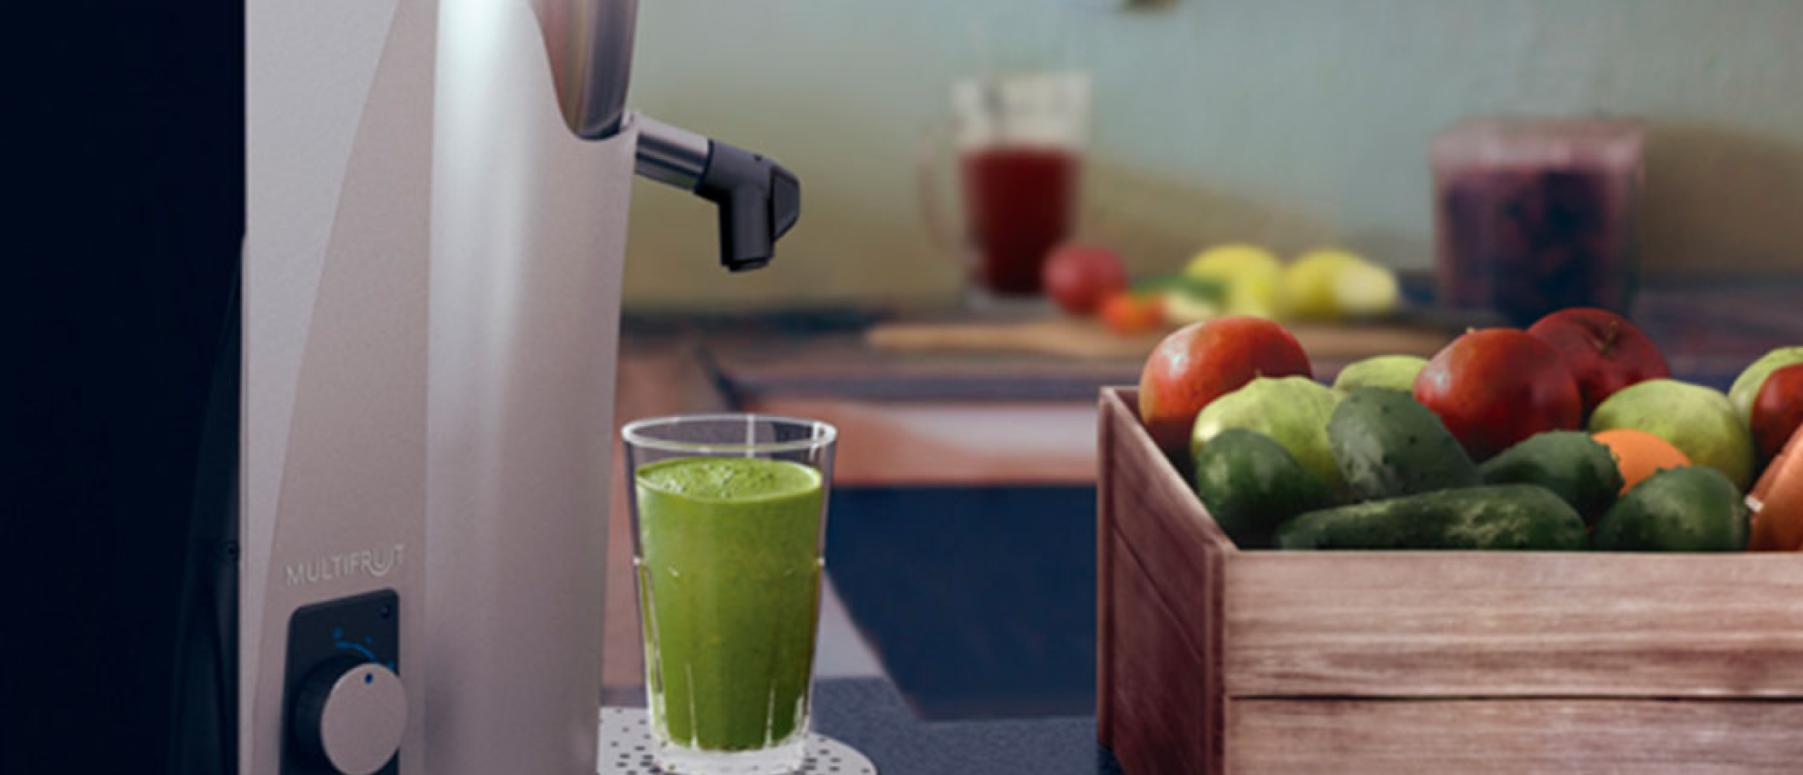 máquina de suco - Multfruit